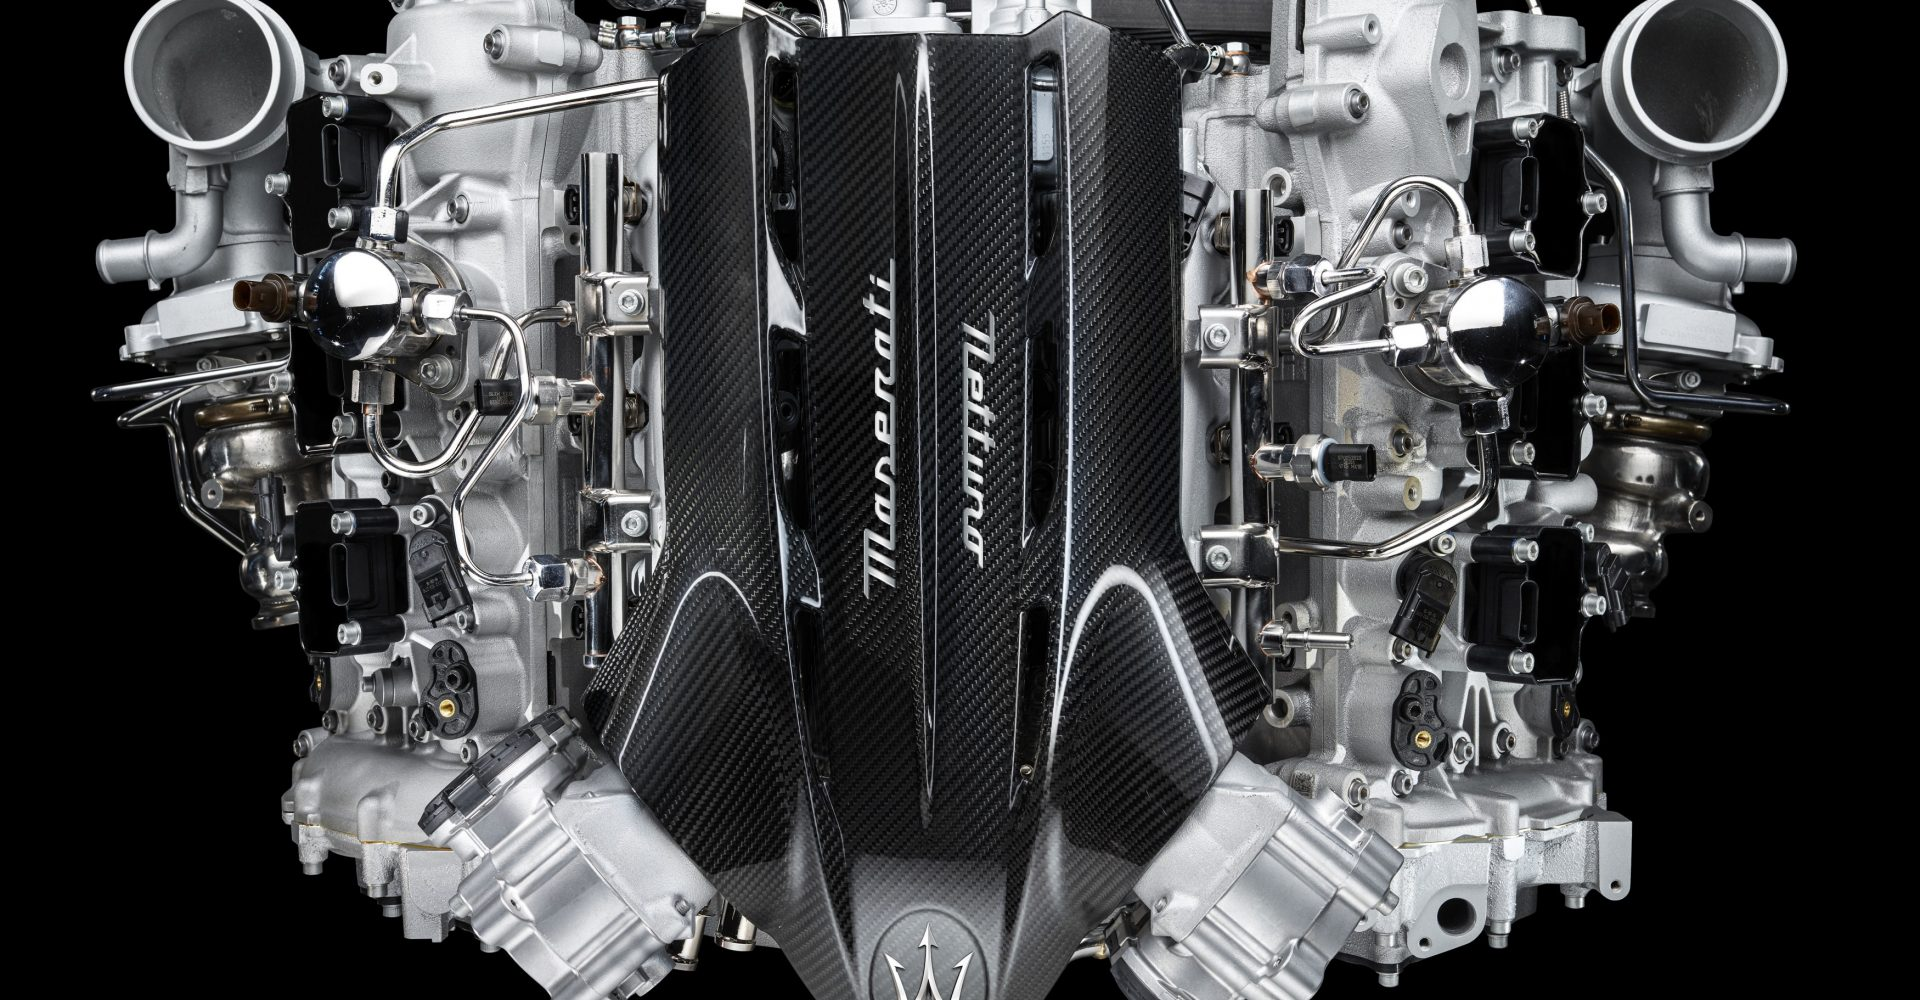 Maserati releases new details surrounding MC20 supercar engine